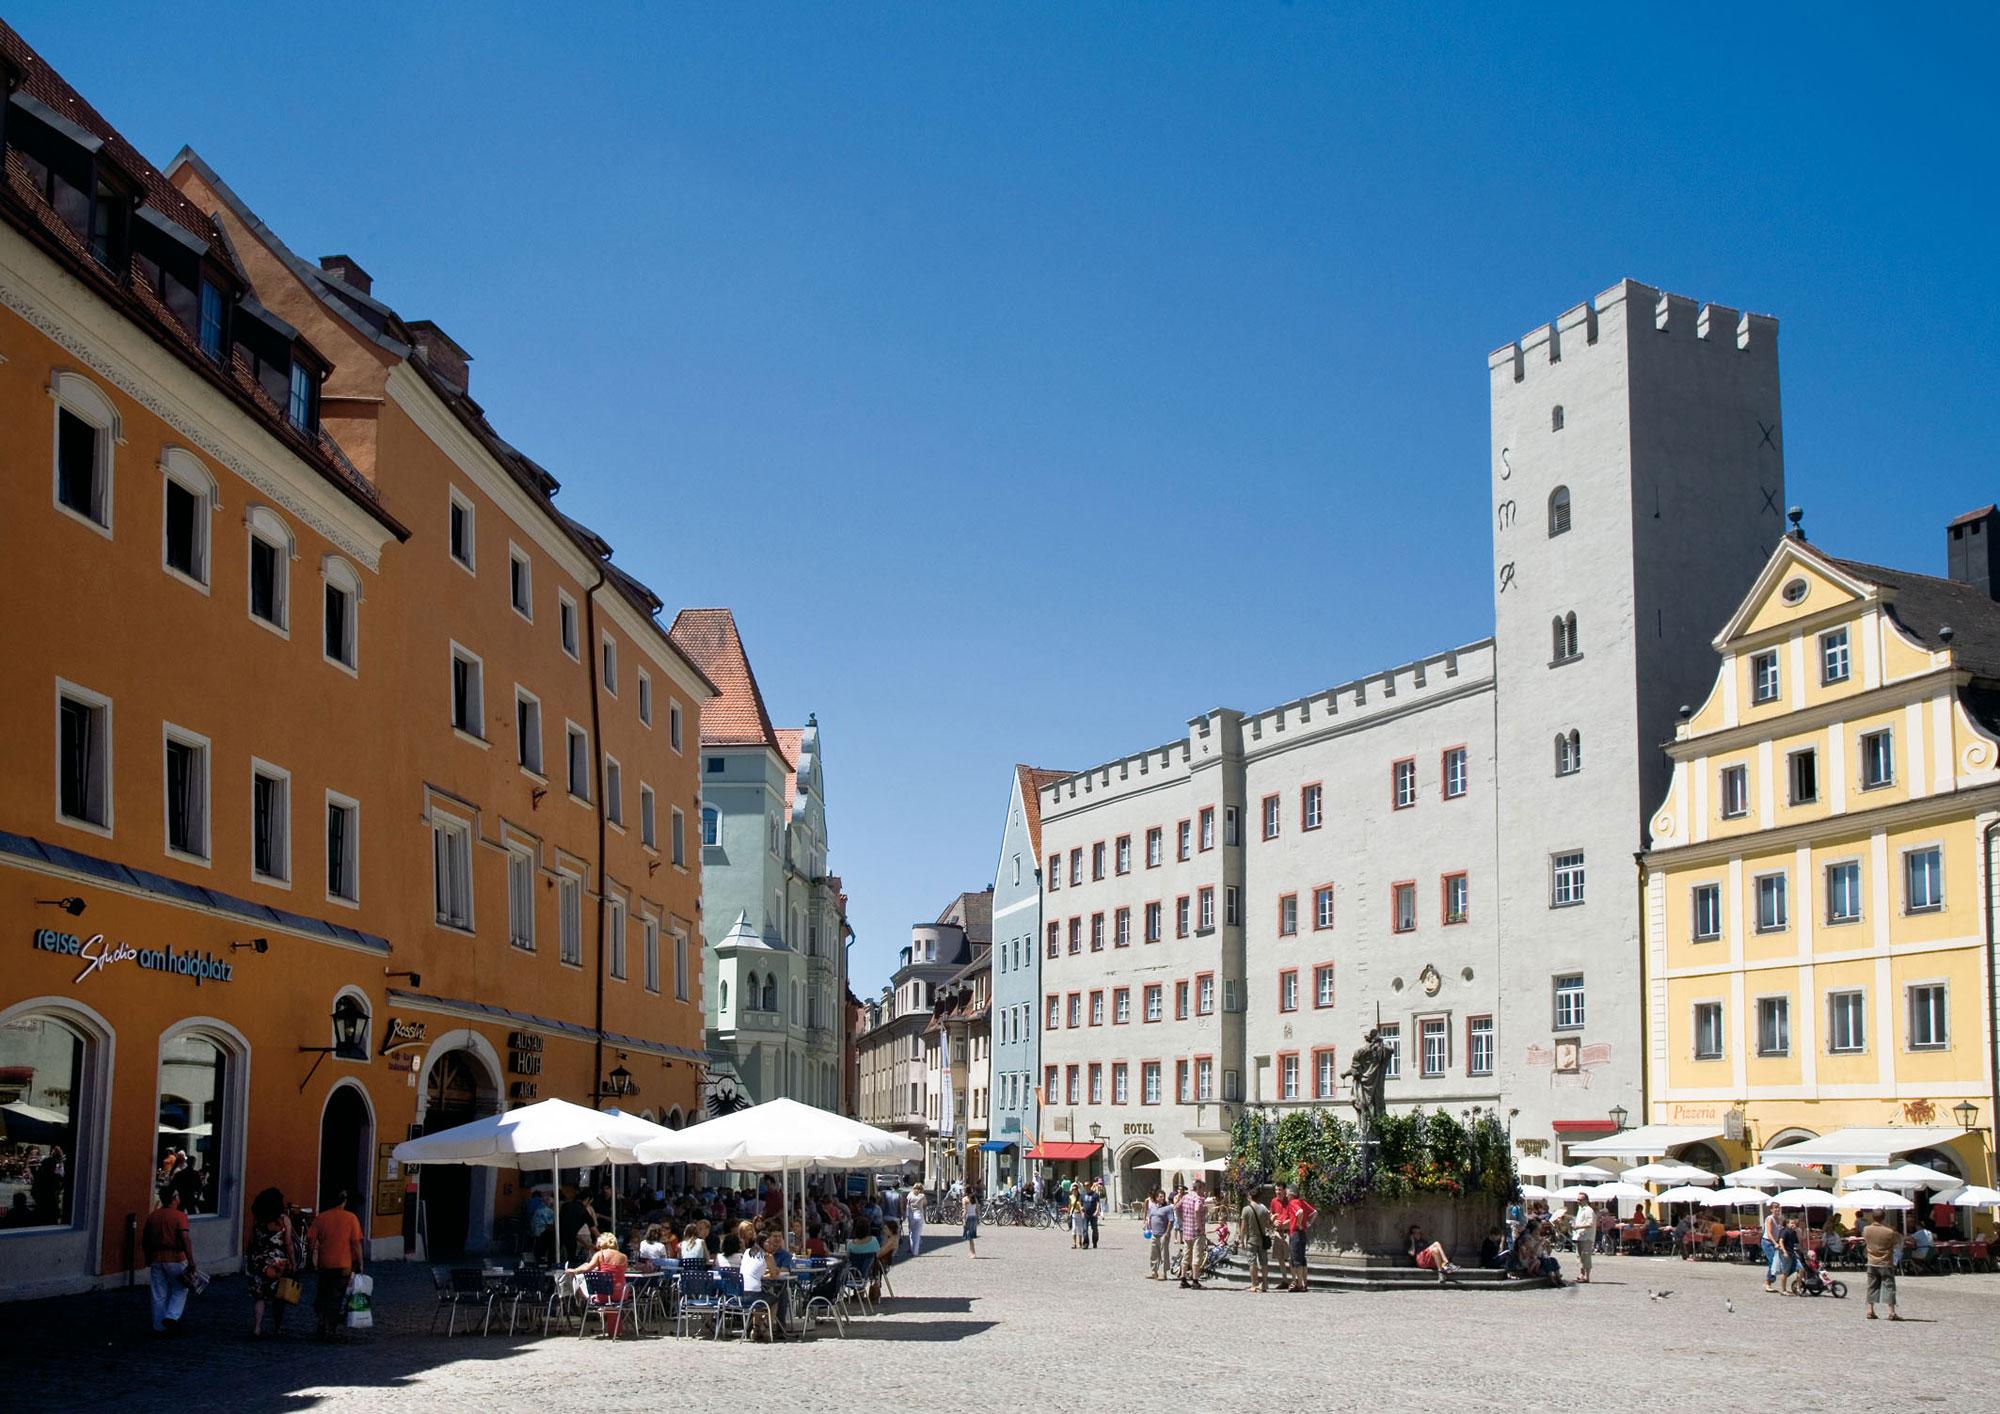 Medieval Places: Haidplatz